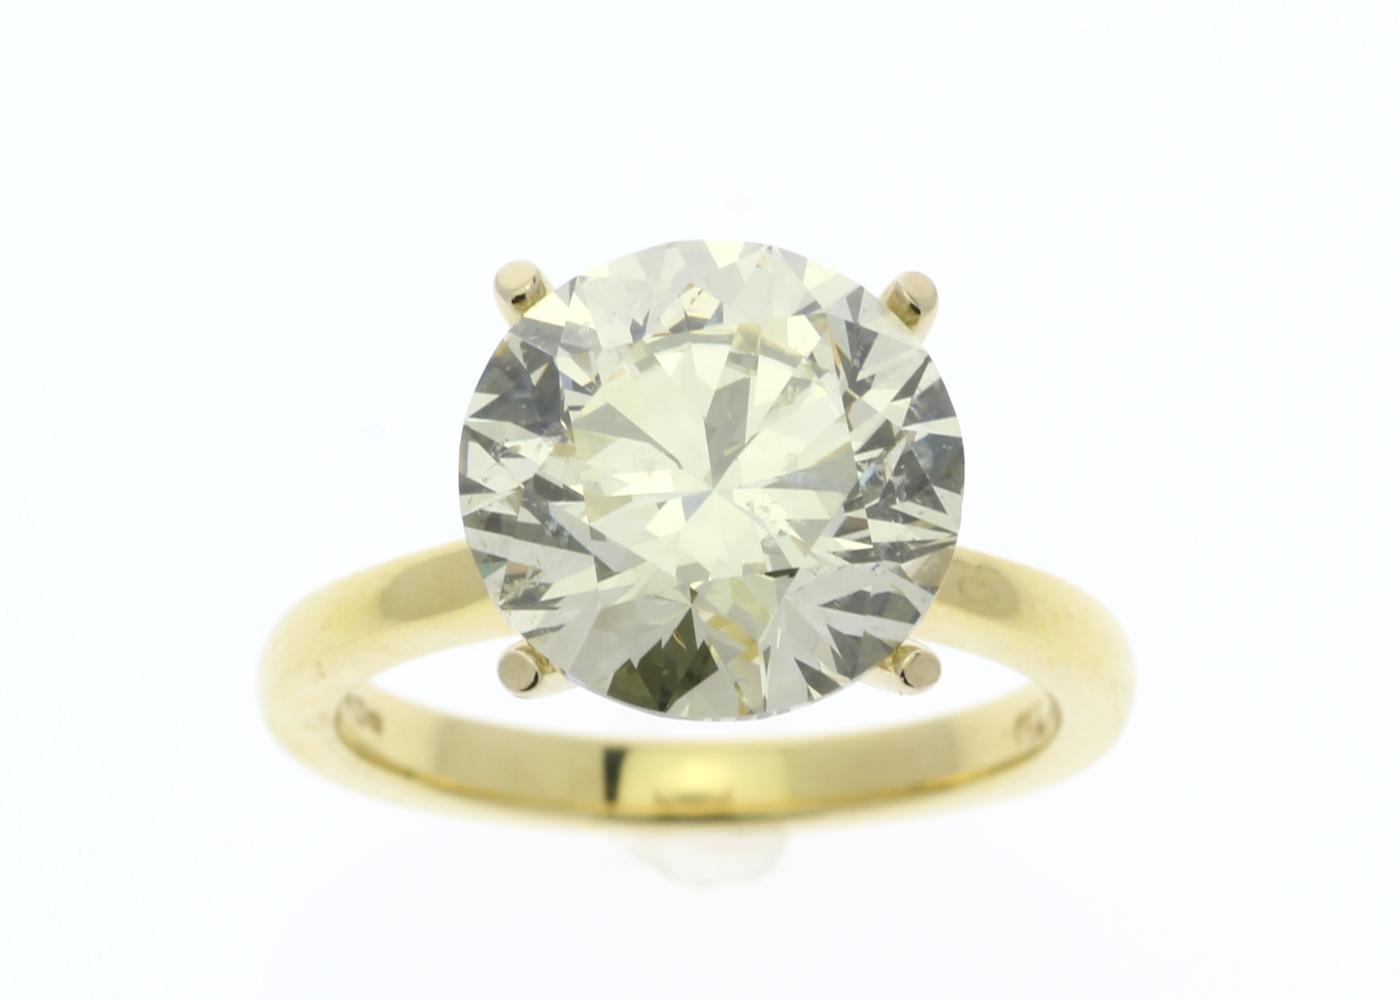 Lot 2 - 18ct Yellow Gold Claw Set Diamond Ring 5.01 Carats